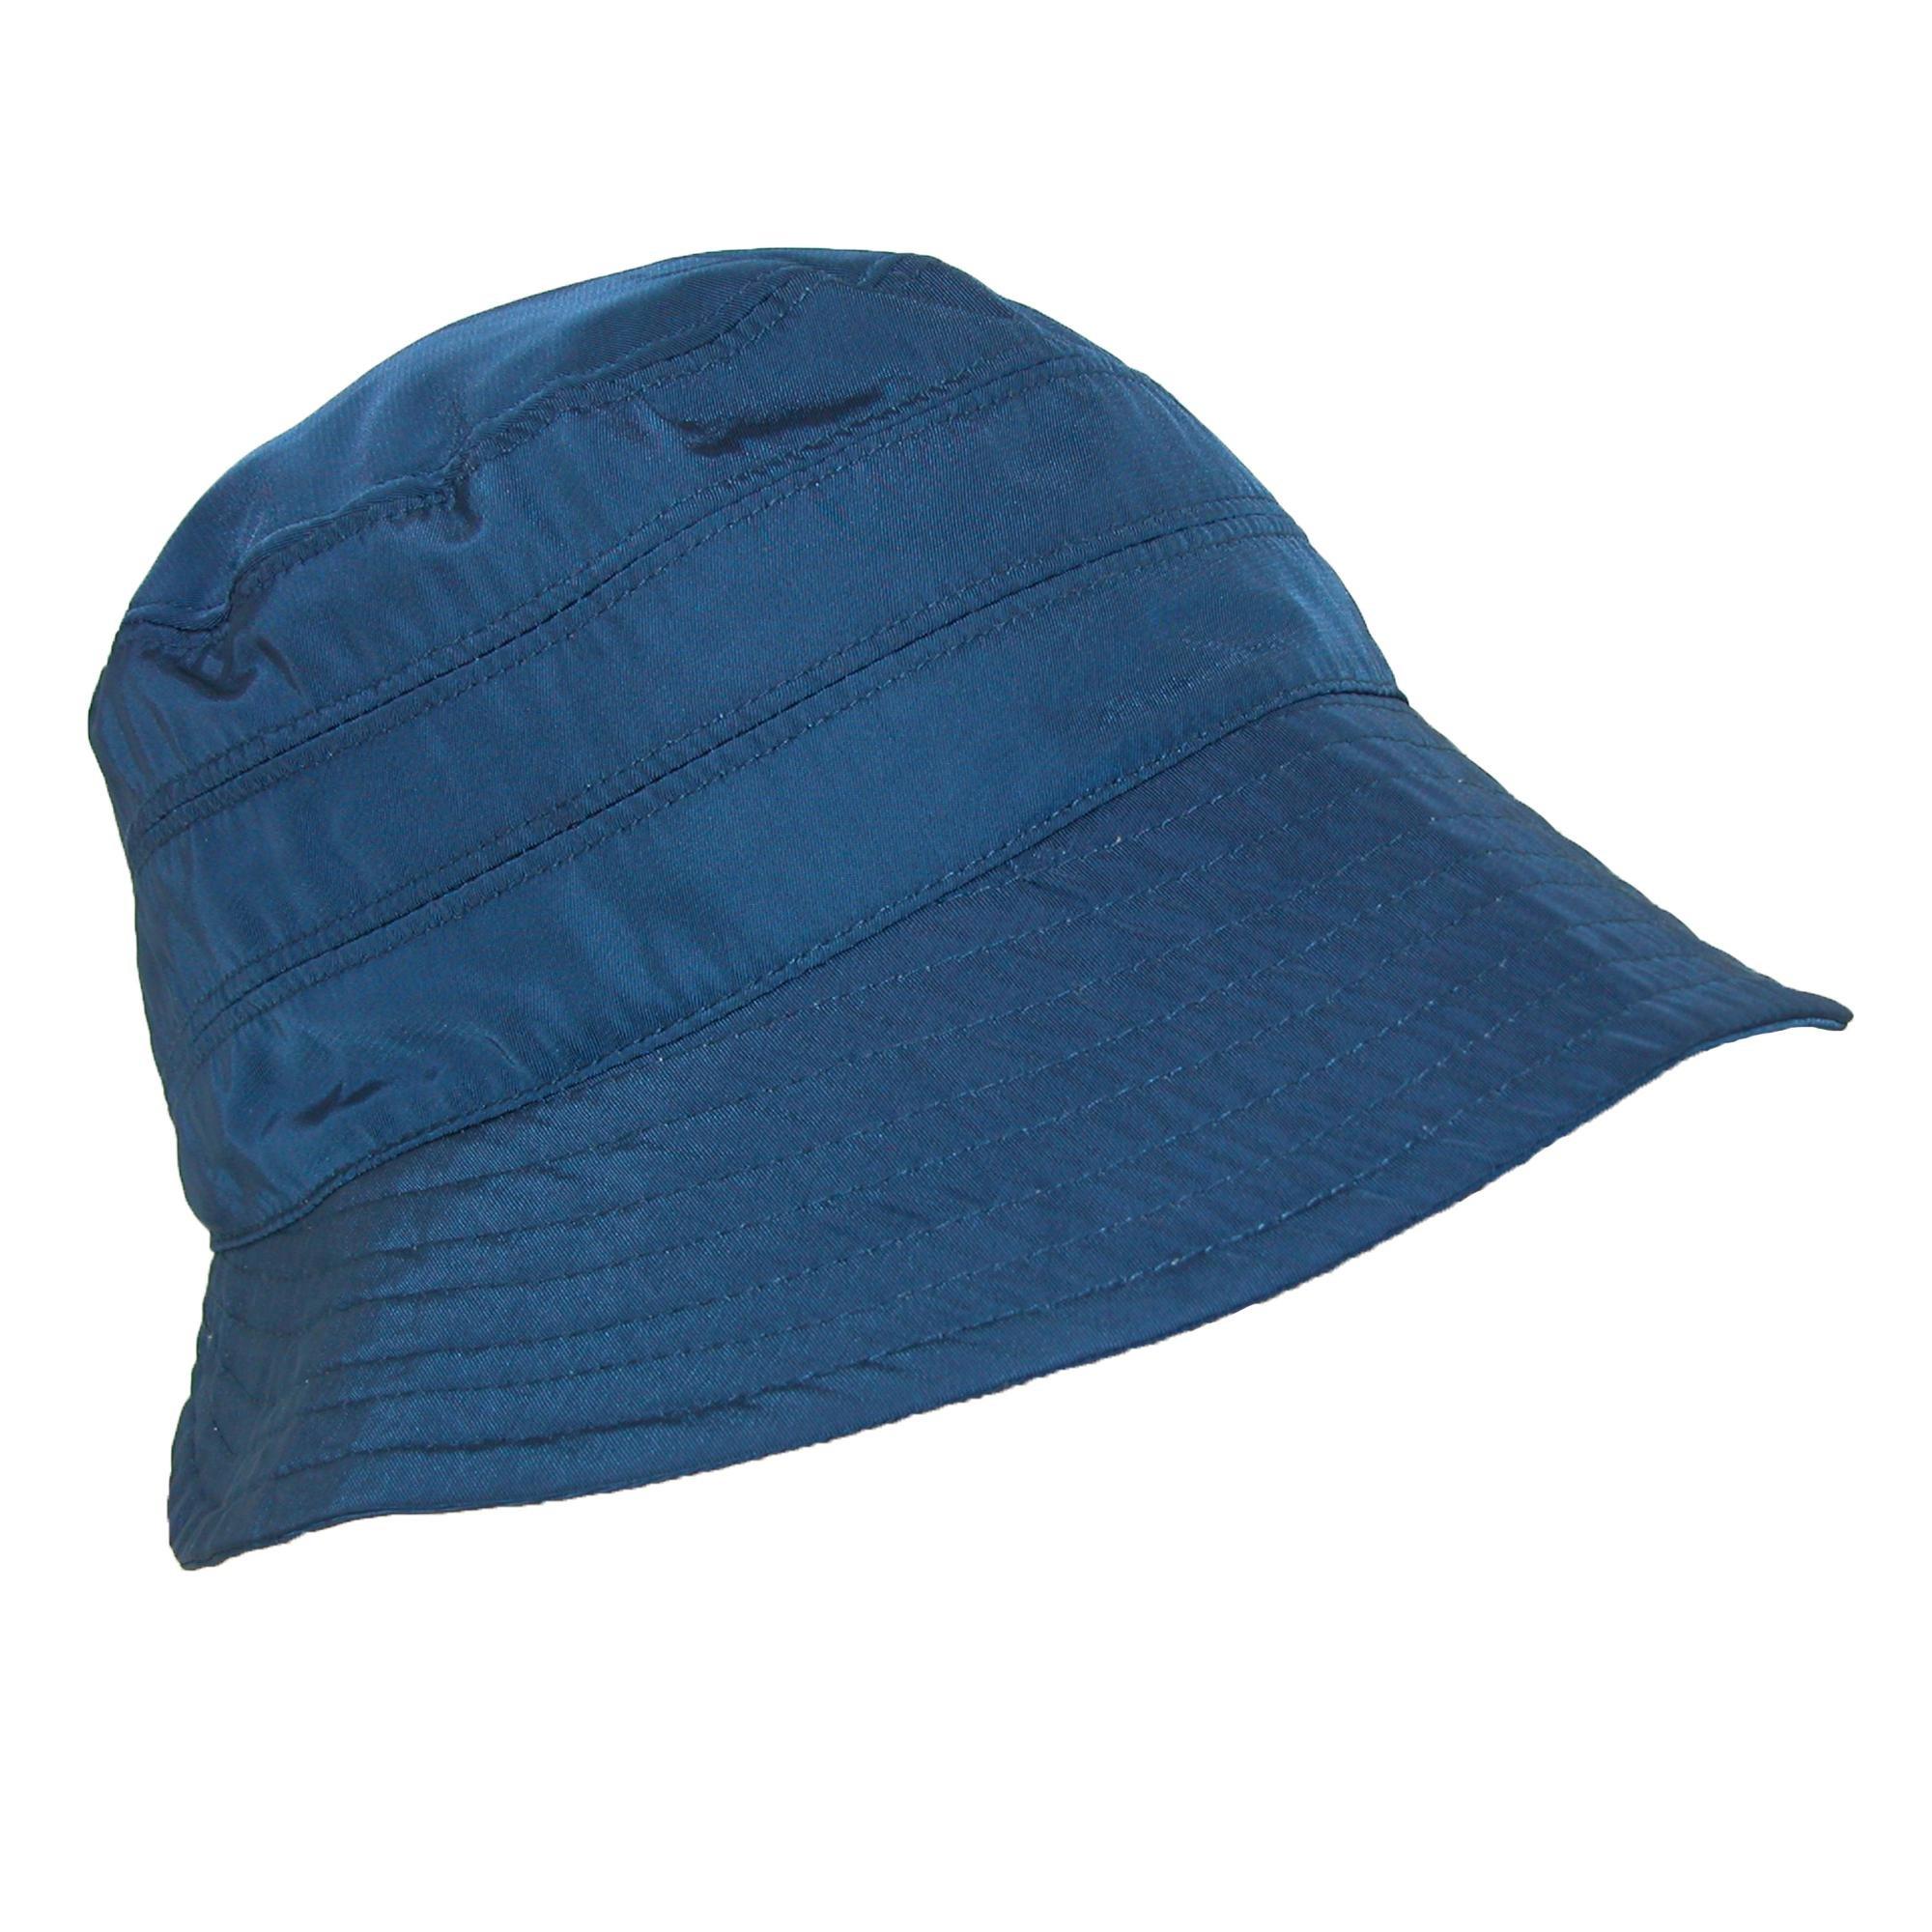 Scala Classico Women's Nylon Waterproof 3 Inch Brim Lined Rain Hat, Navy